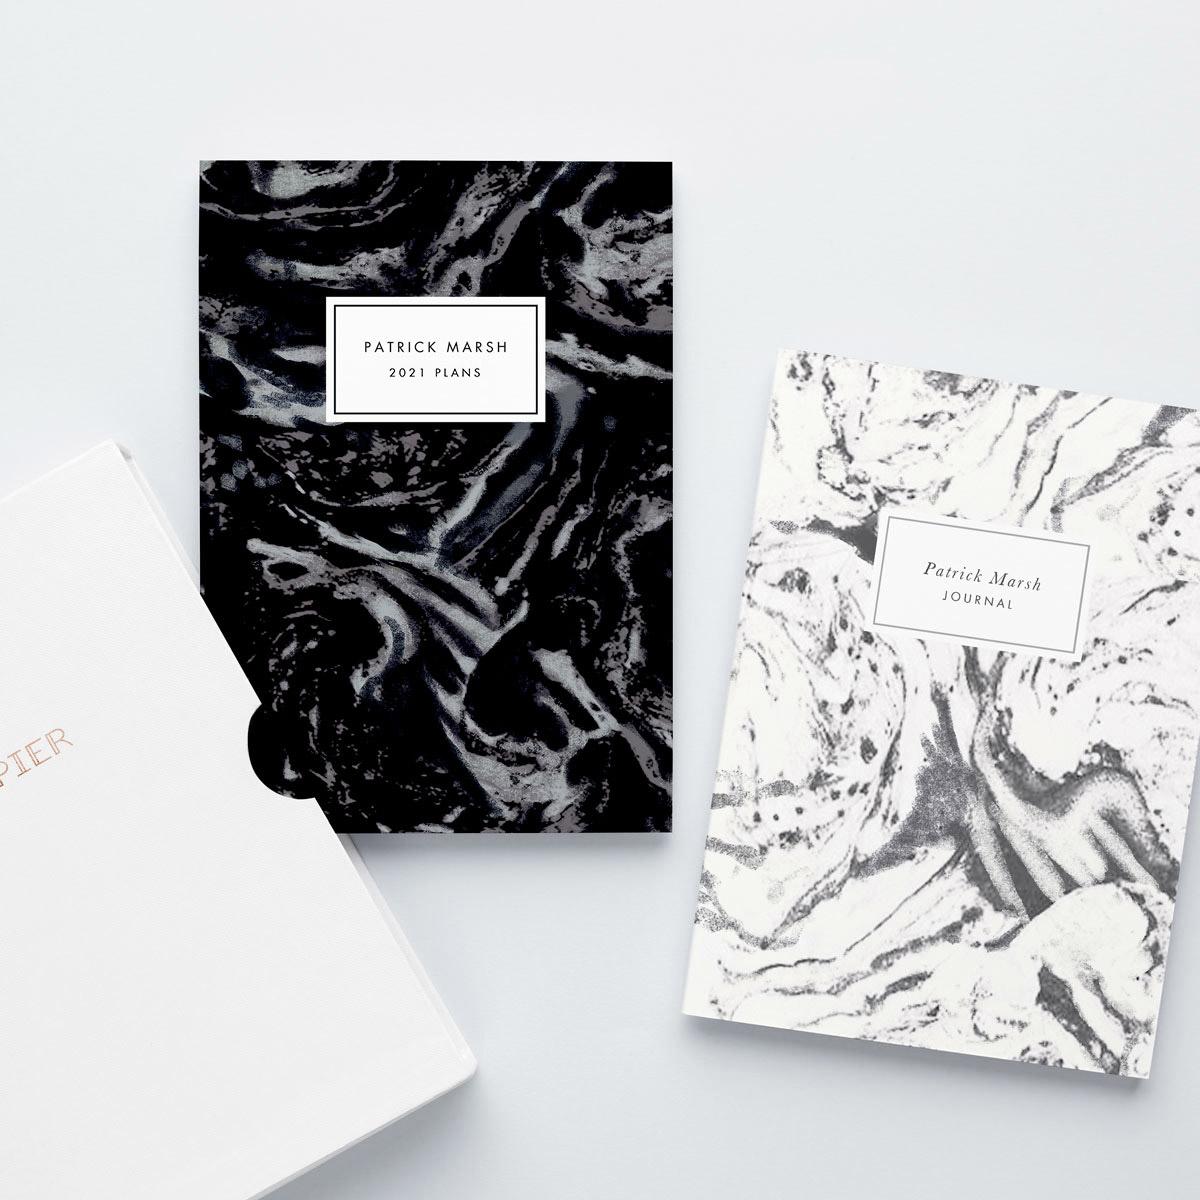 09.19 productimagery bundles 2books 6